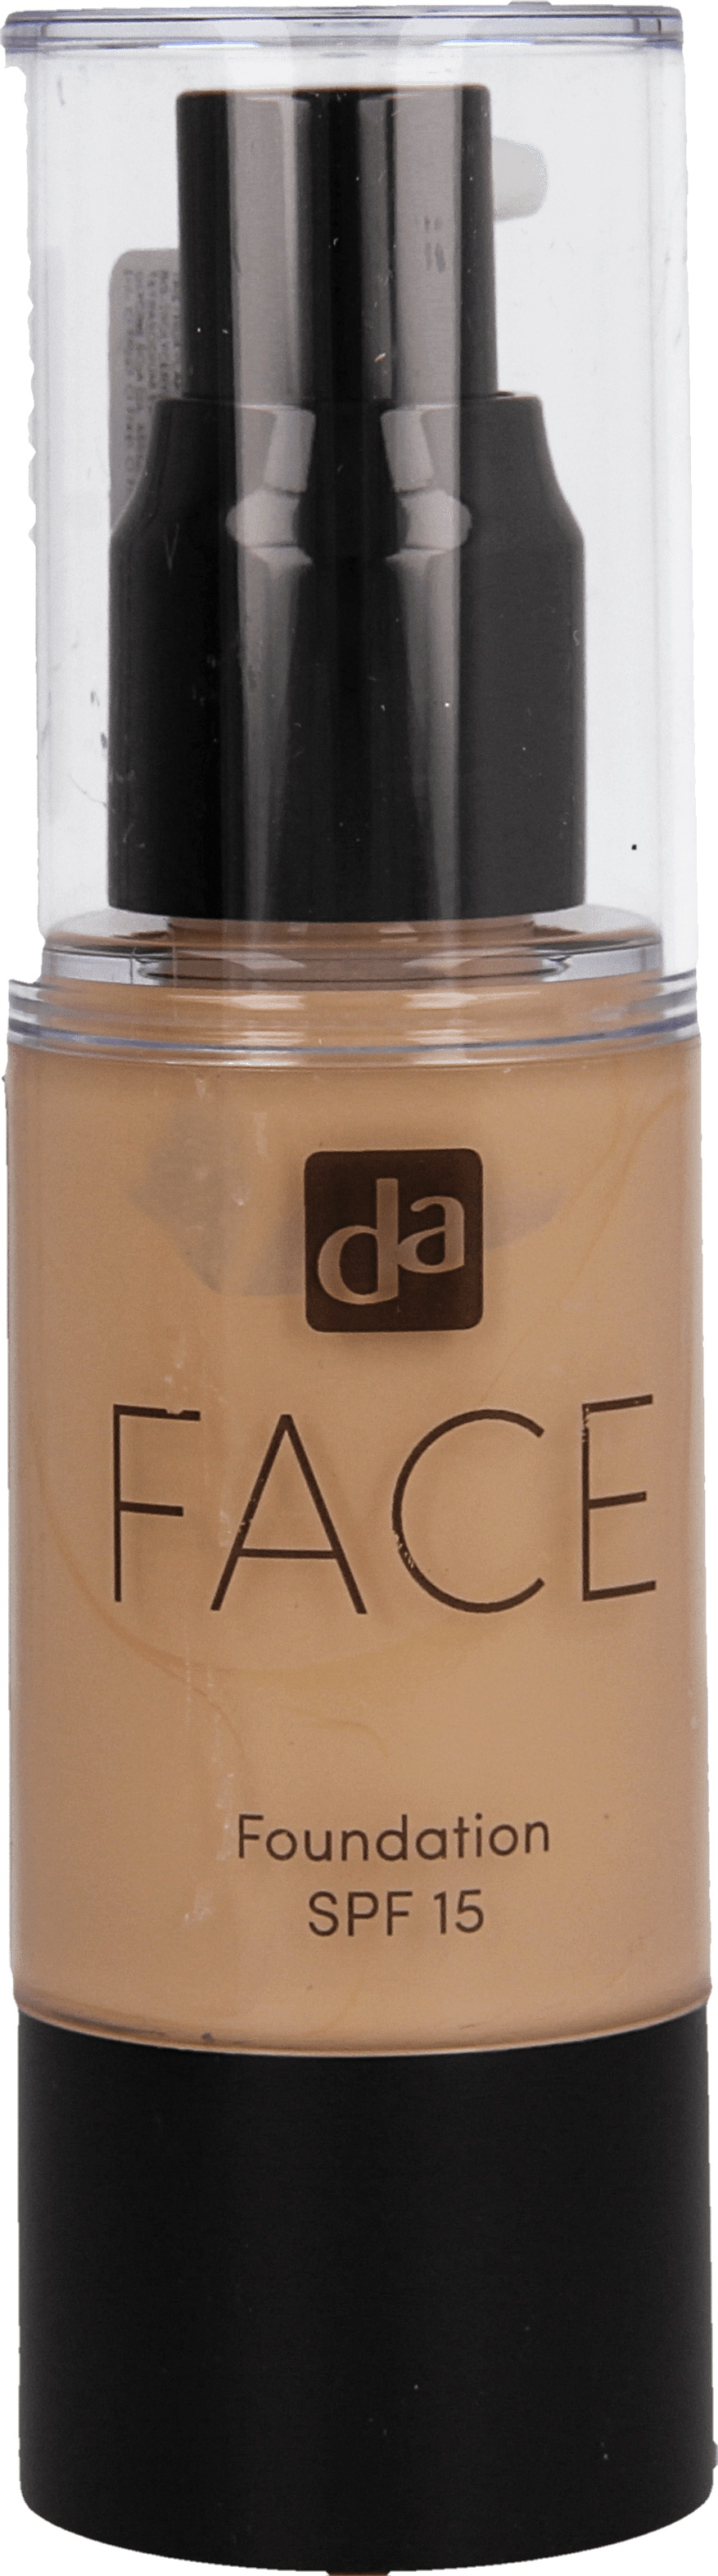 DA Face Foundation SPF15